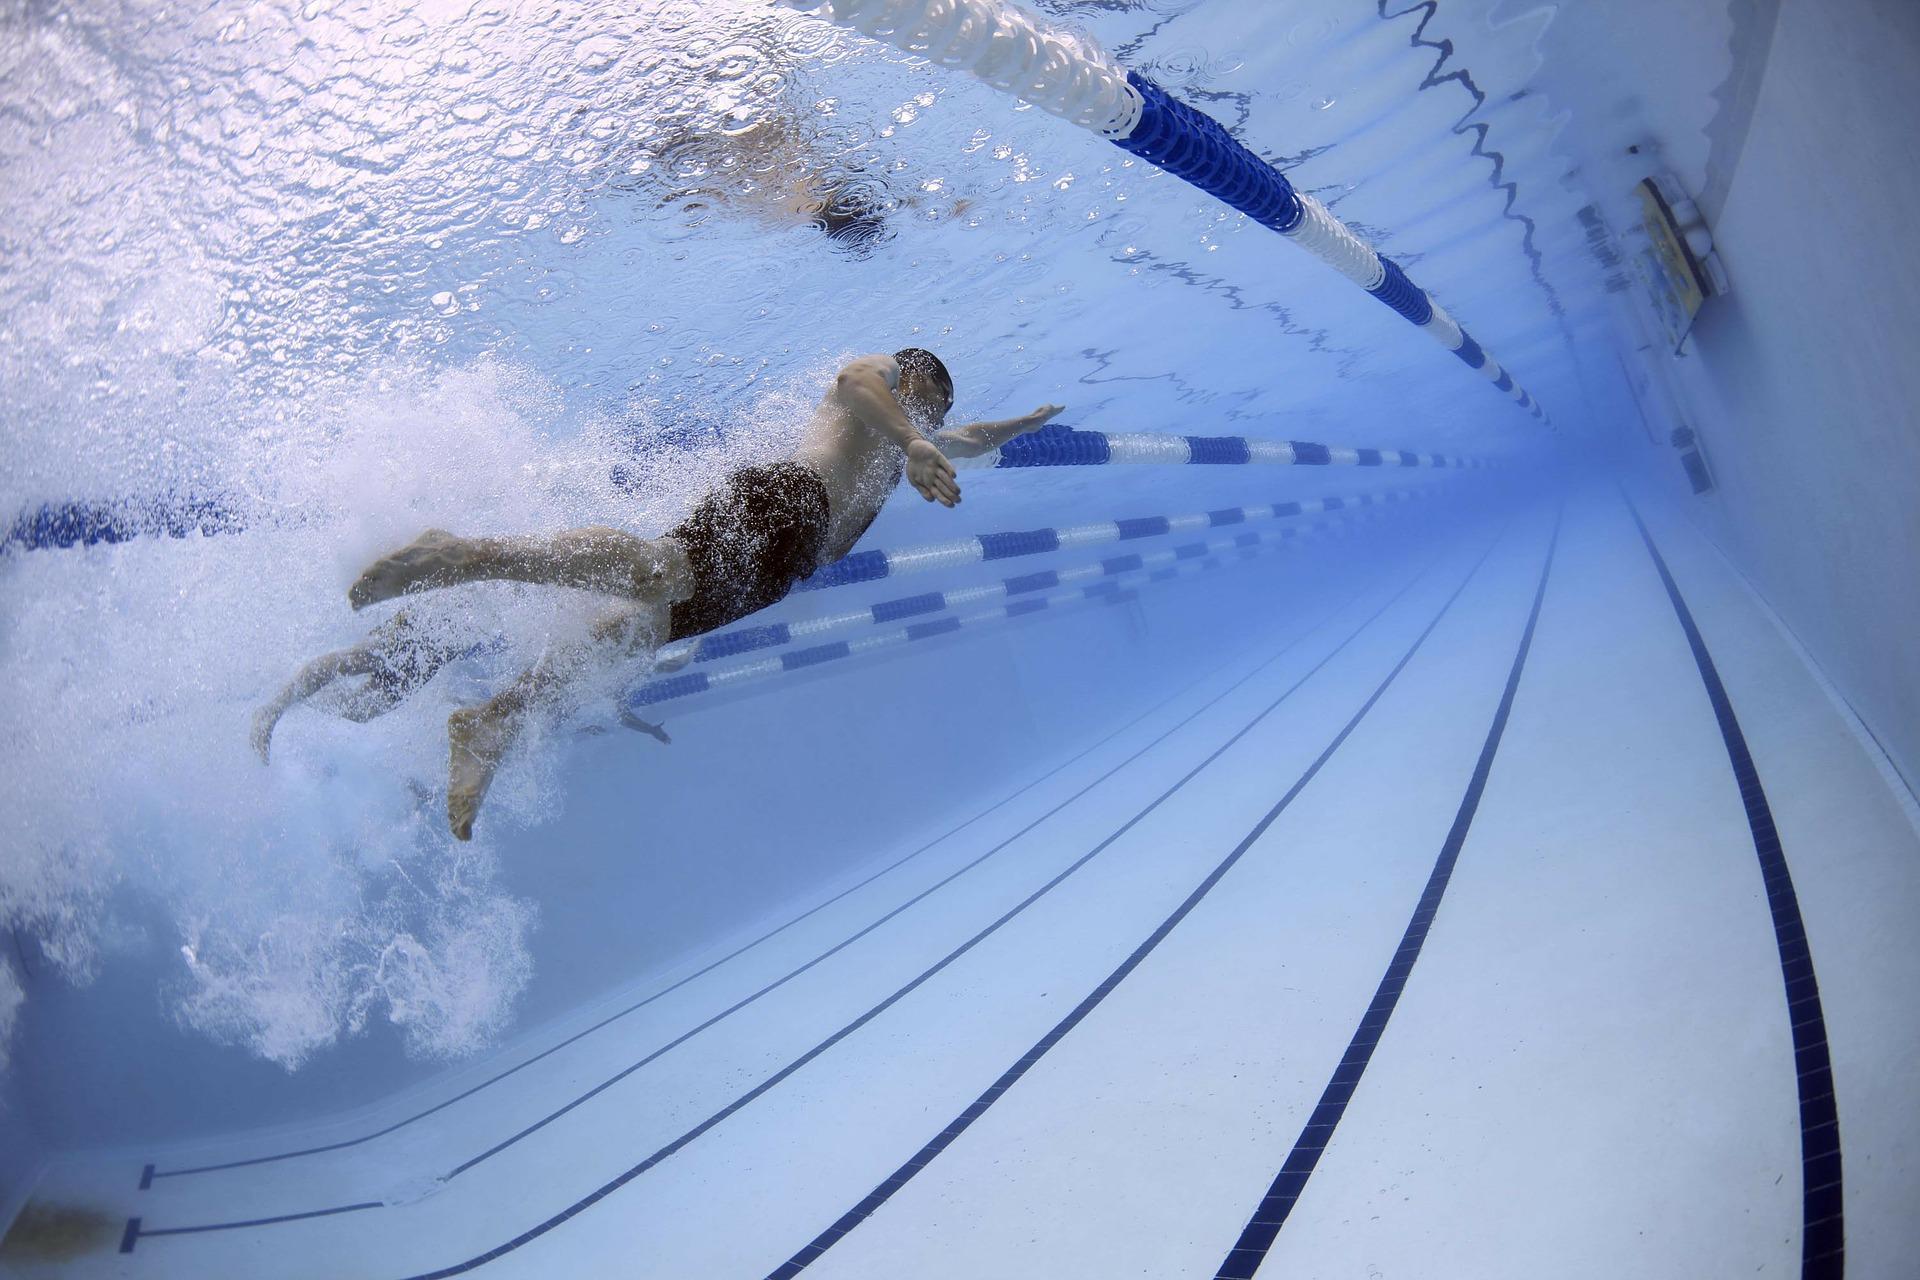 Svømmeklub på træningslejr i Tyrkiet